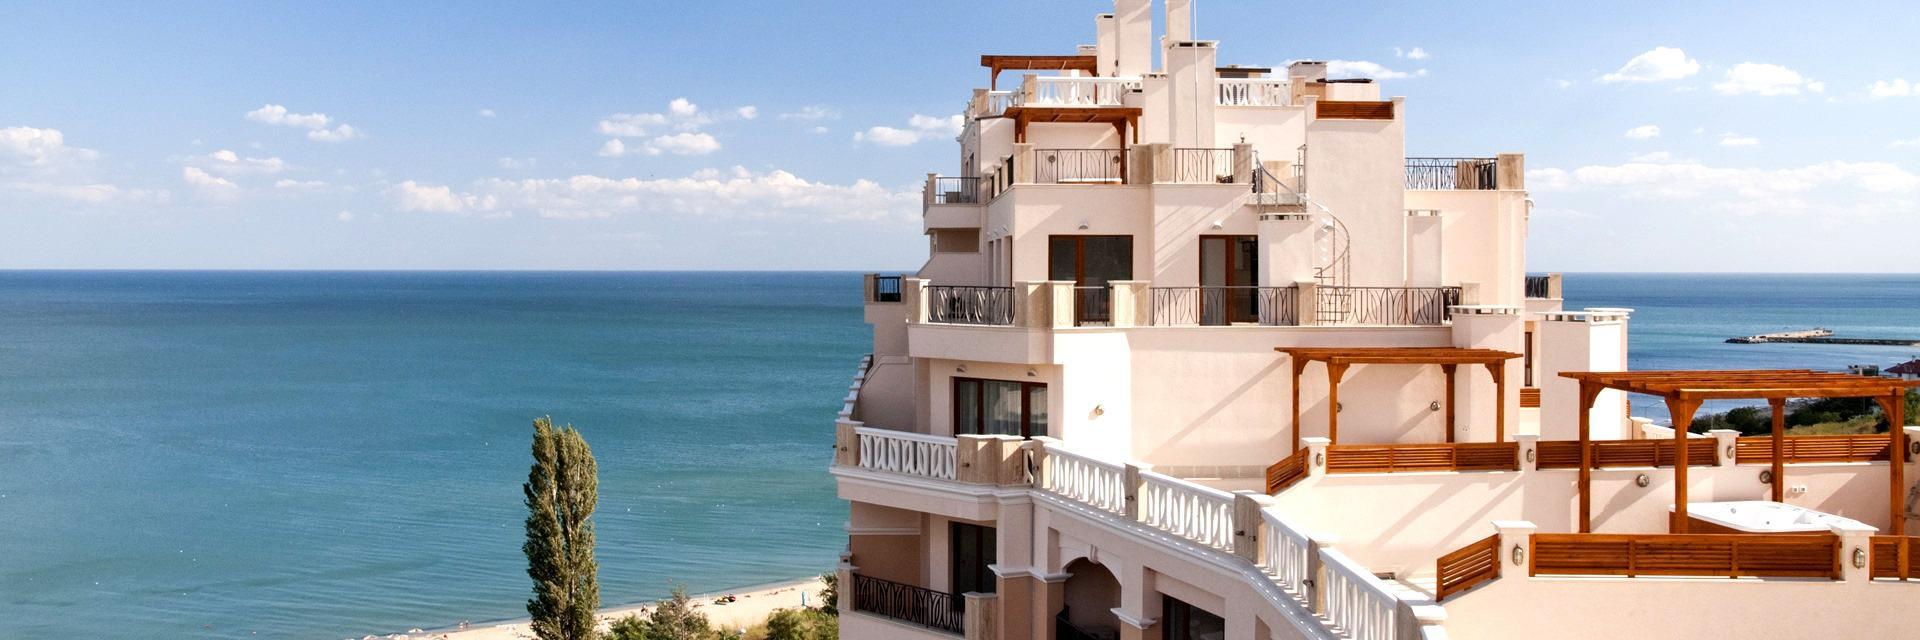 Луксозен тристаен апартамент с прекрасна морска гледка